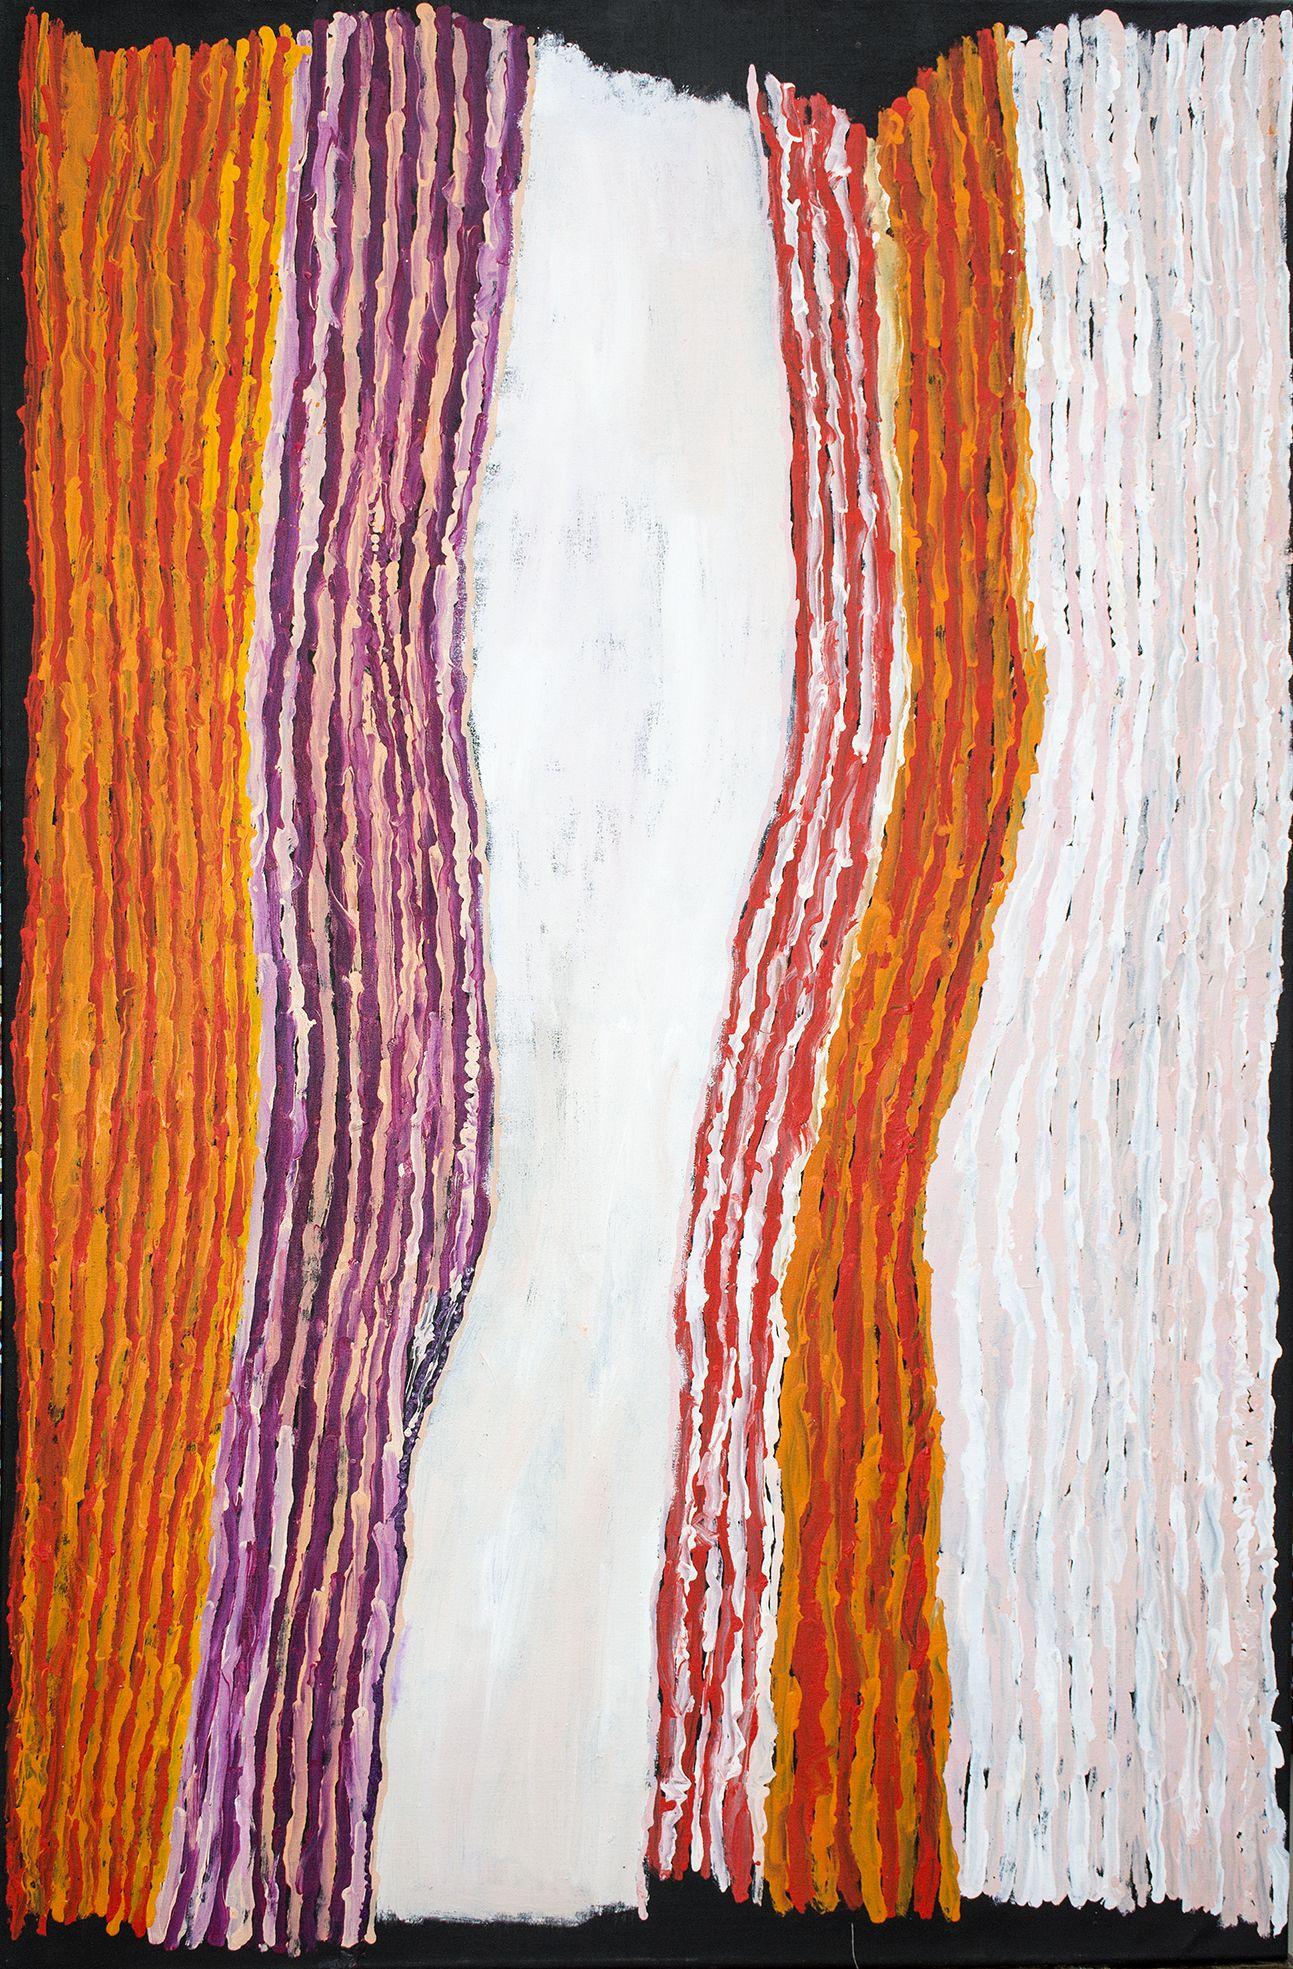 Œuvre de l'artiste Ray Ken de Tjala Arts. Titre : Tali Sand Dune. Format : 150 x 90 cm. © Photo Aboriginal Signature Estrangin gallery with the courtesy of the artist and Tjala Arts.